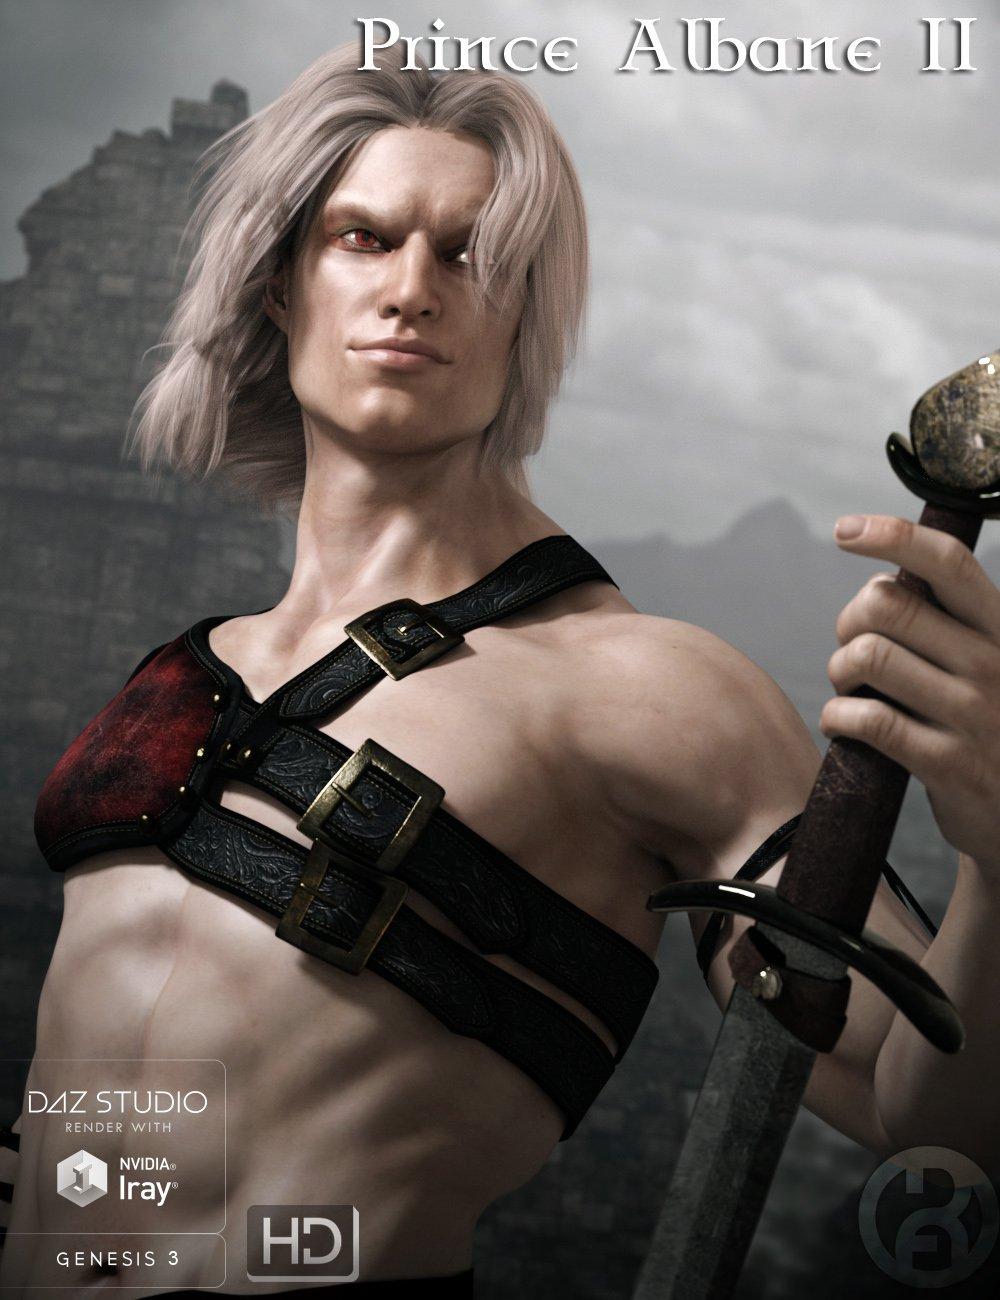 Prince Albane II for Genesis 3 Male by: RawArt, 3D Models by Daz 3D